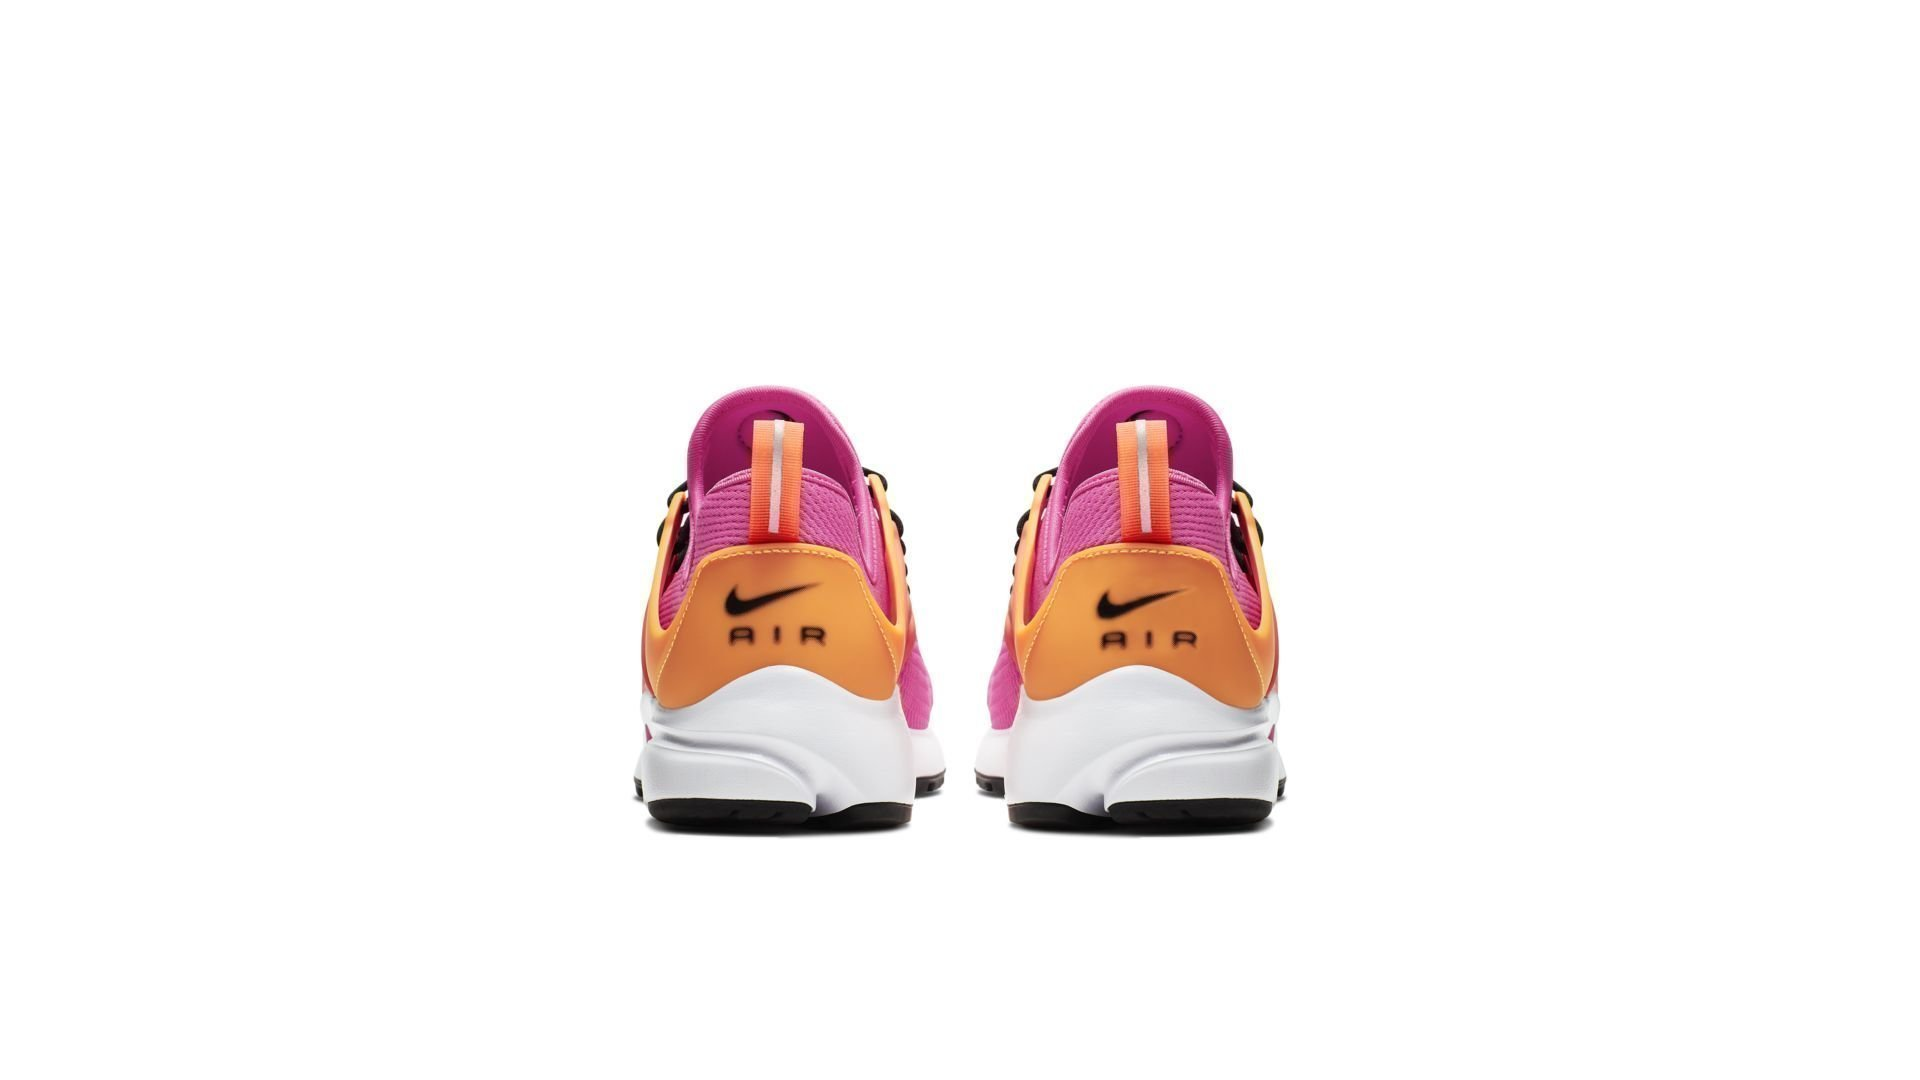 Nike Air Presto Laser Fuchsia Laser Orange (W) (878068-607)